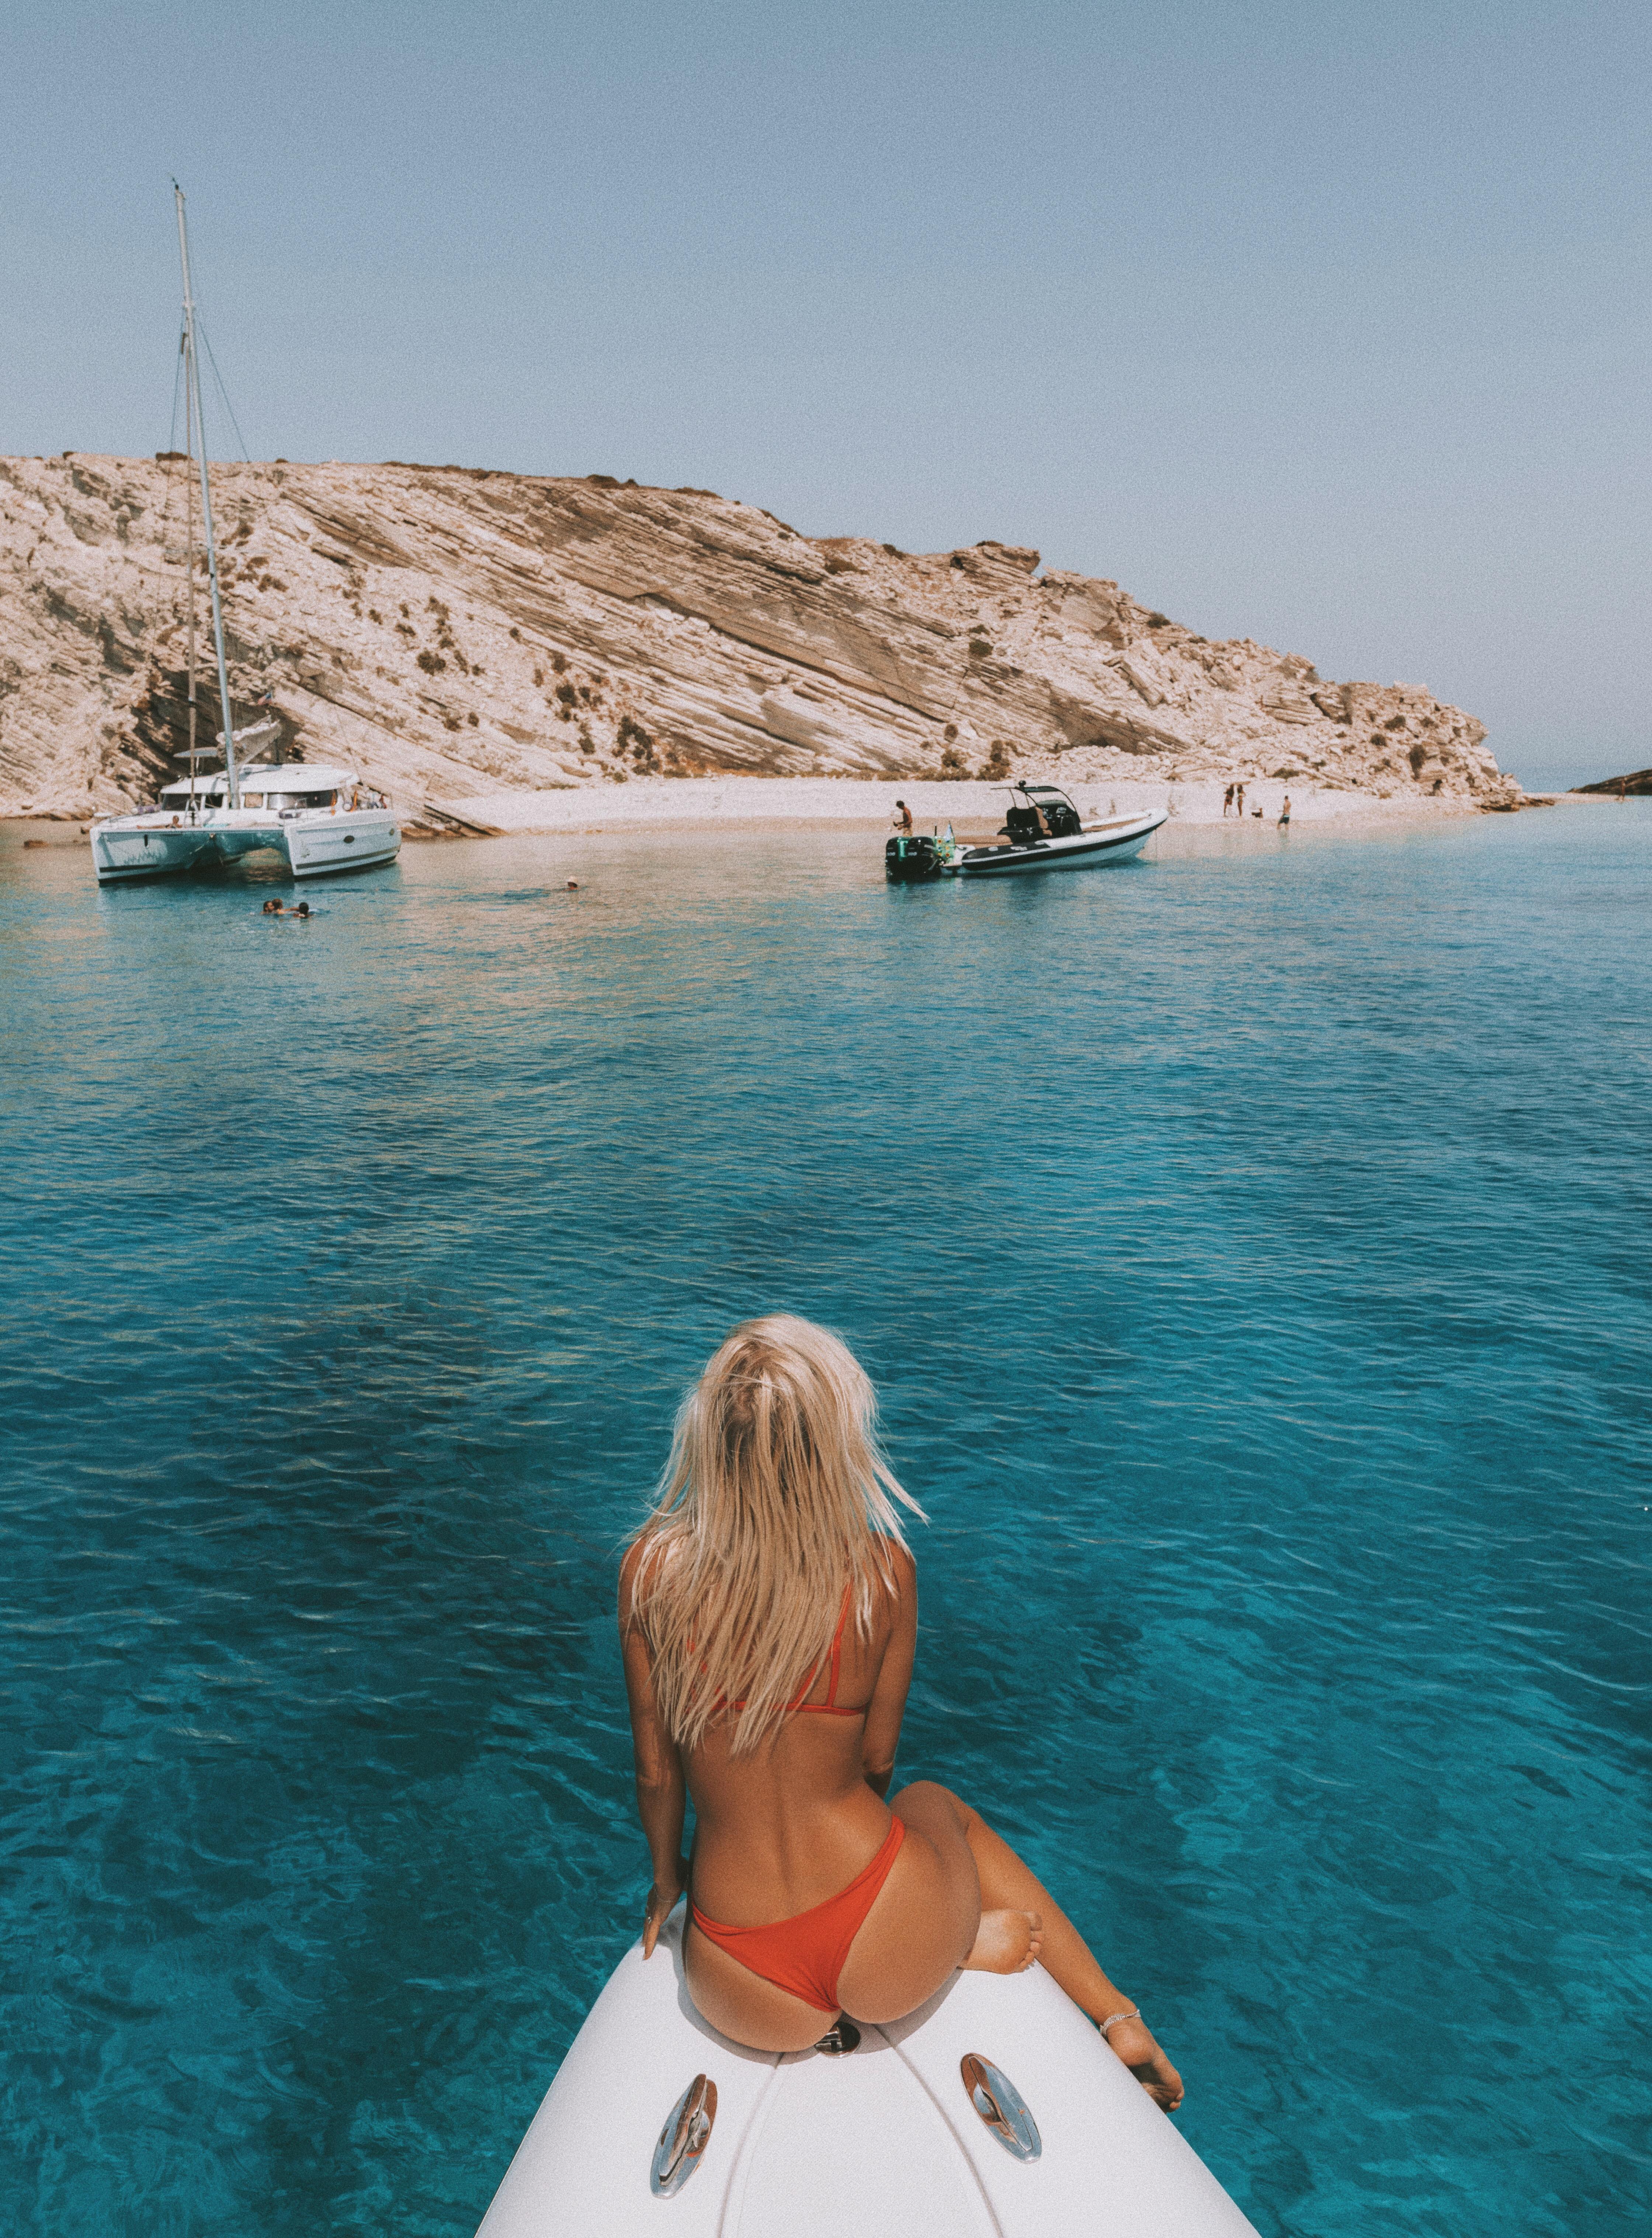 Greek Island of Kos with Casa Cook